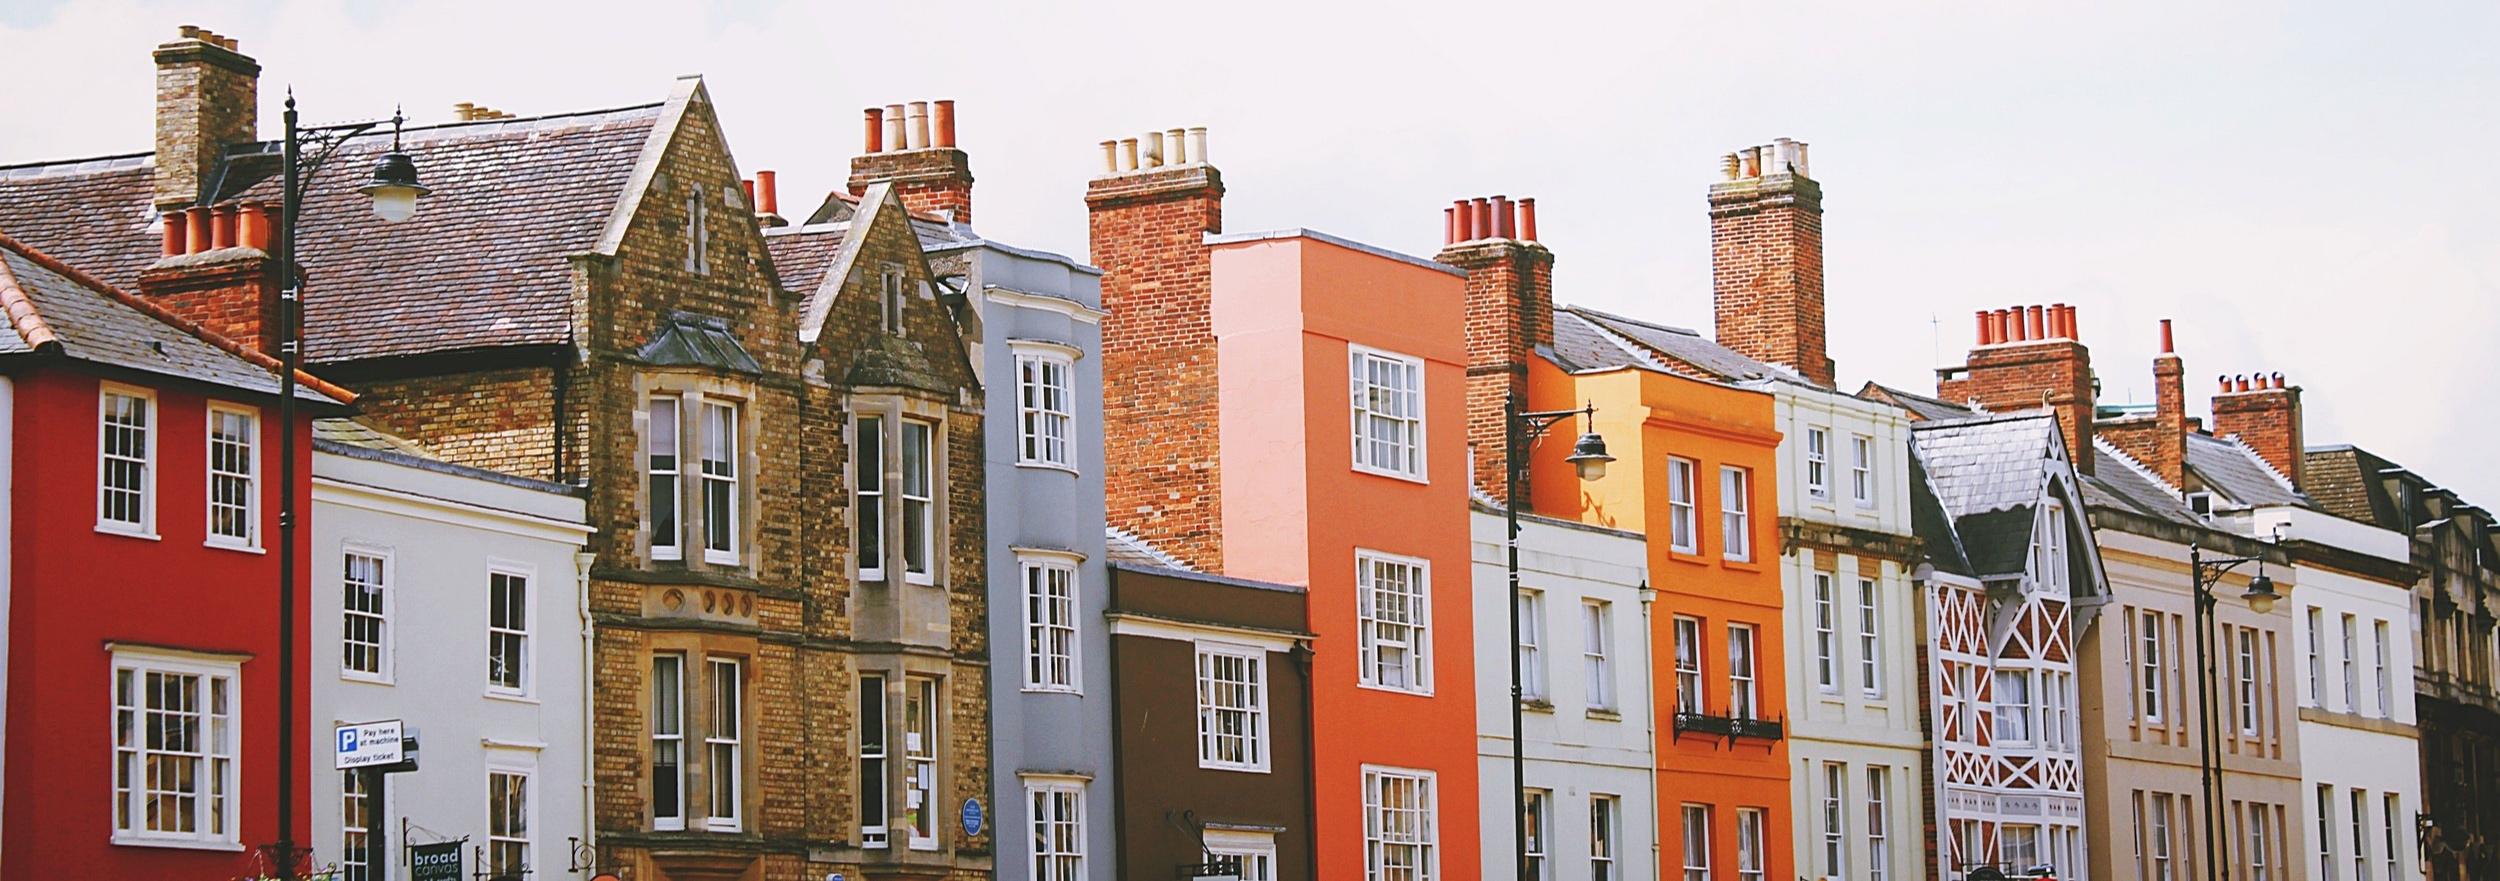 Row+of+houses.jpg